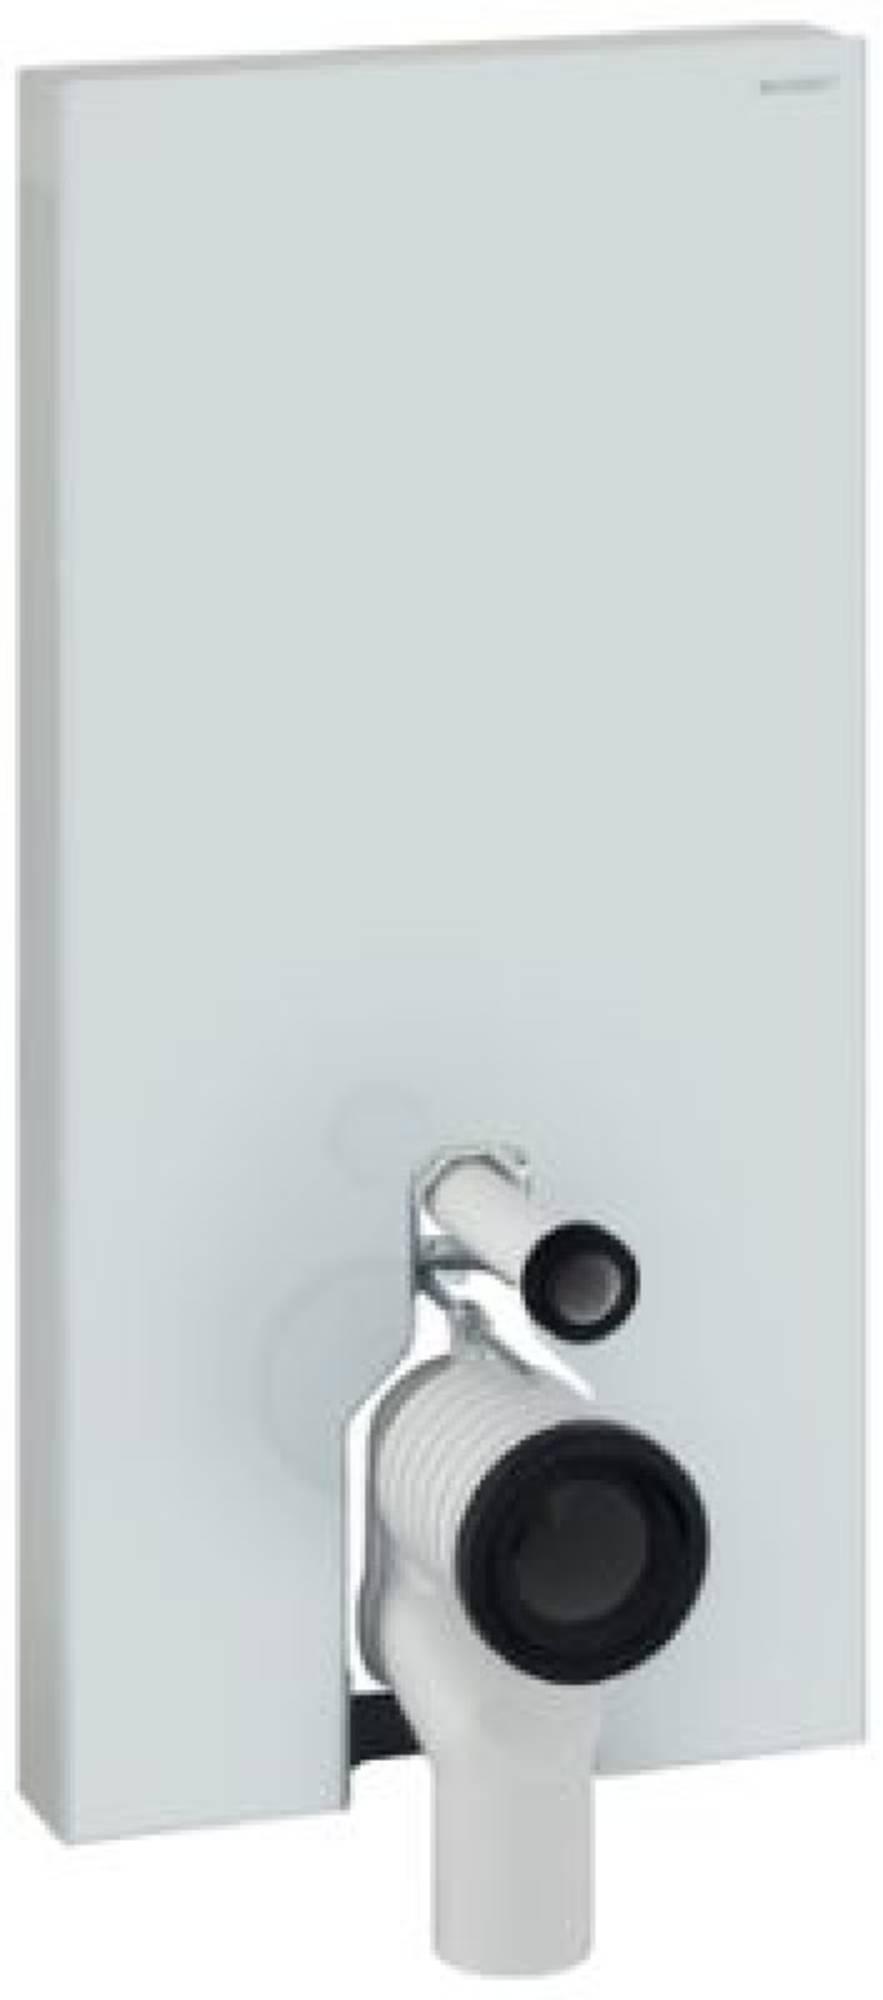 Geberit Monolith plus module voor staand closet h101 glas zwart aluminium